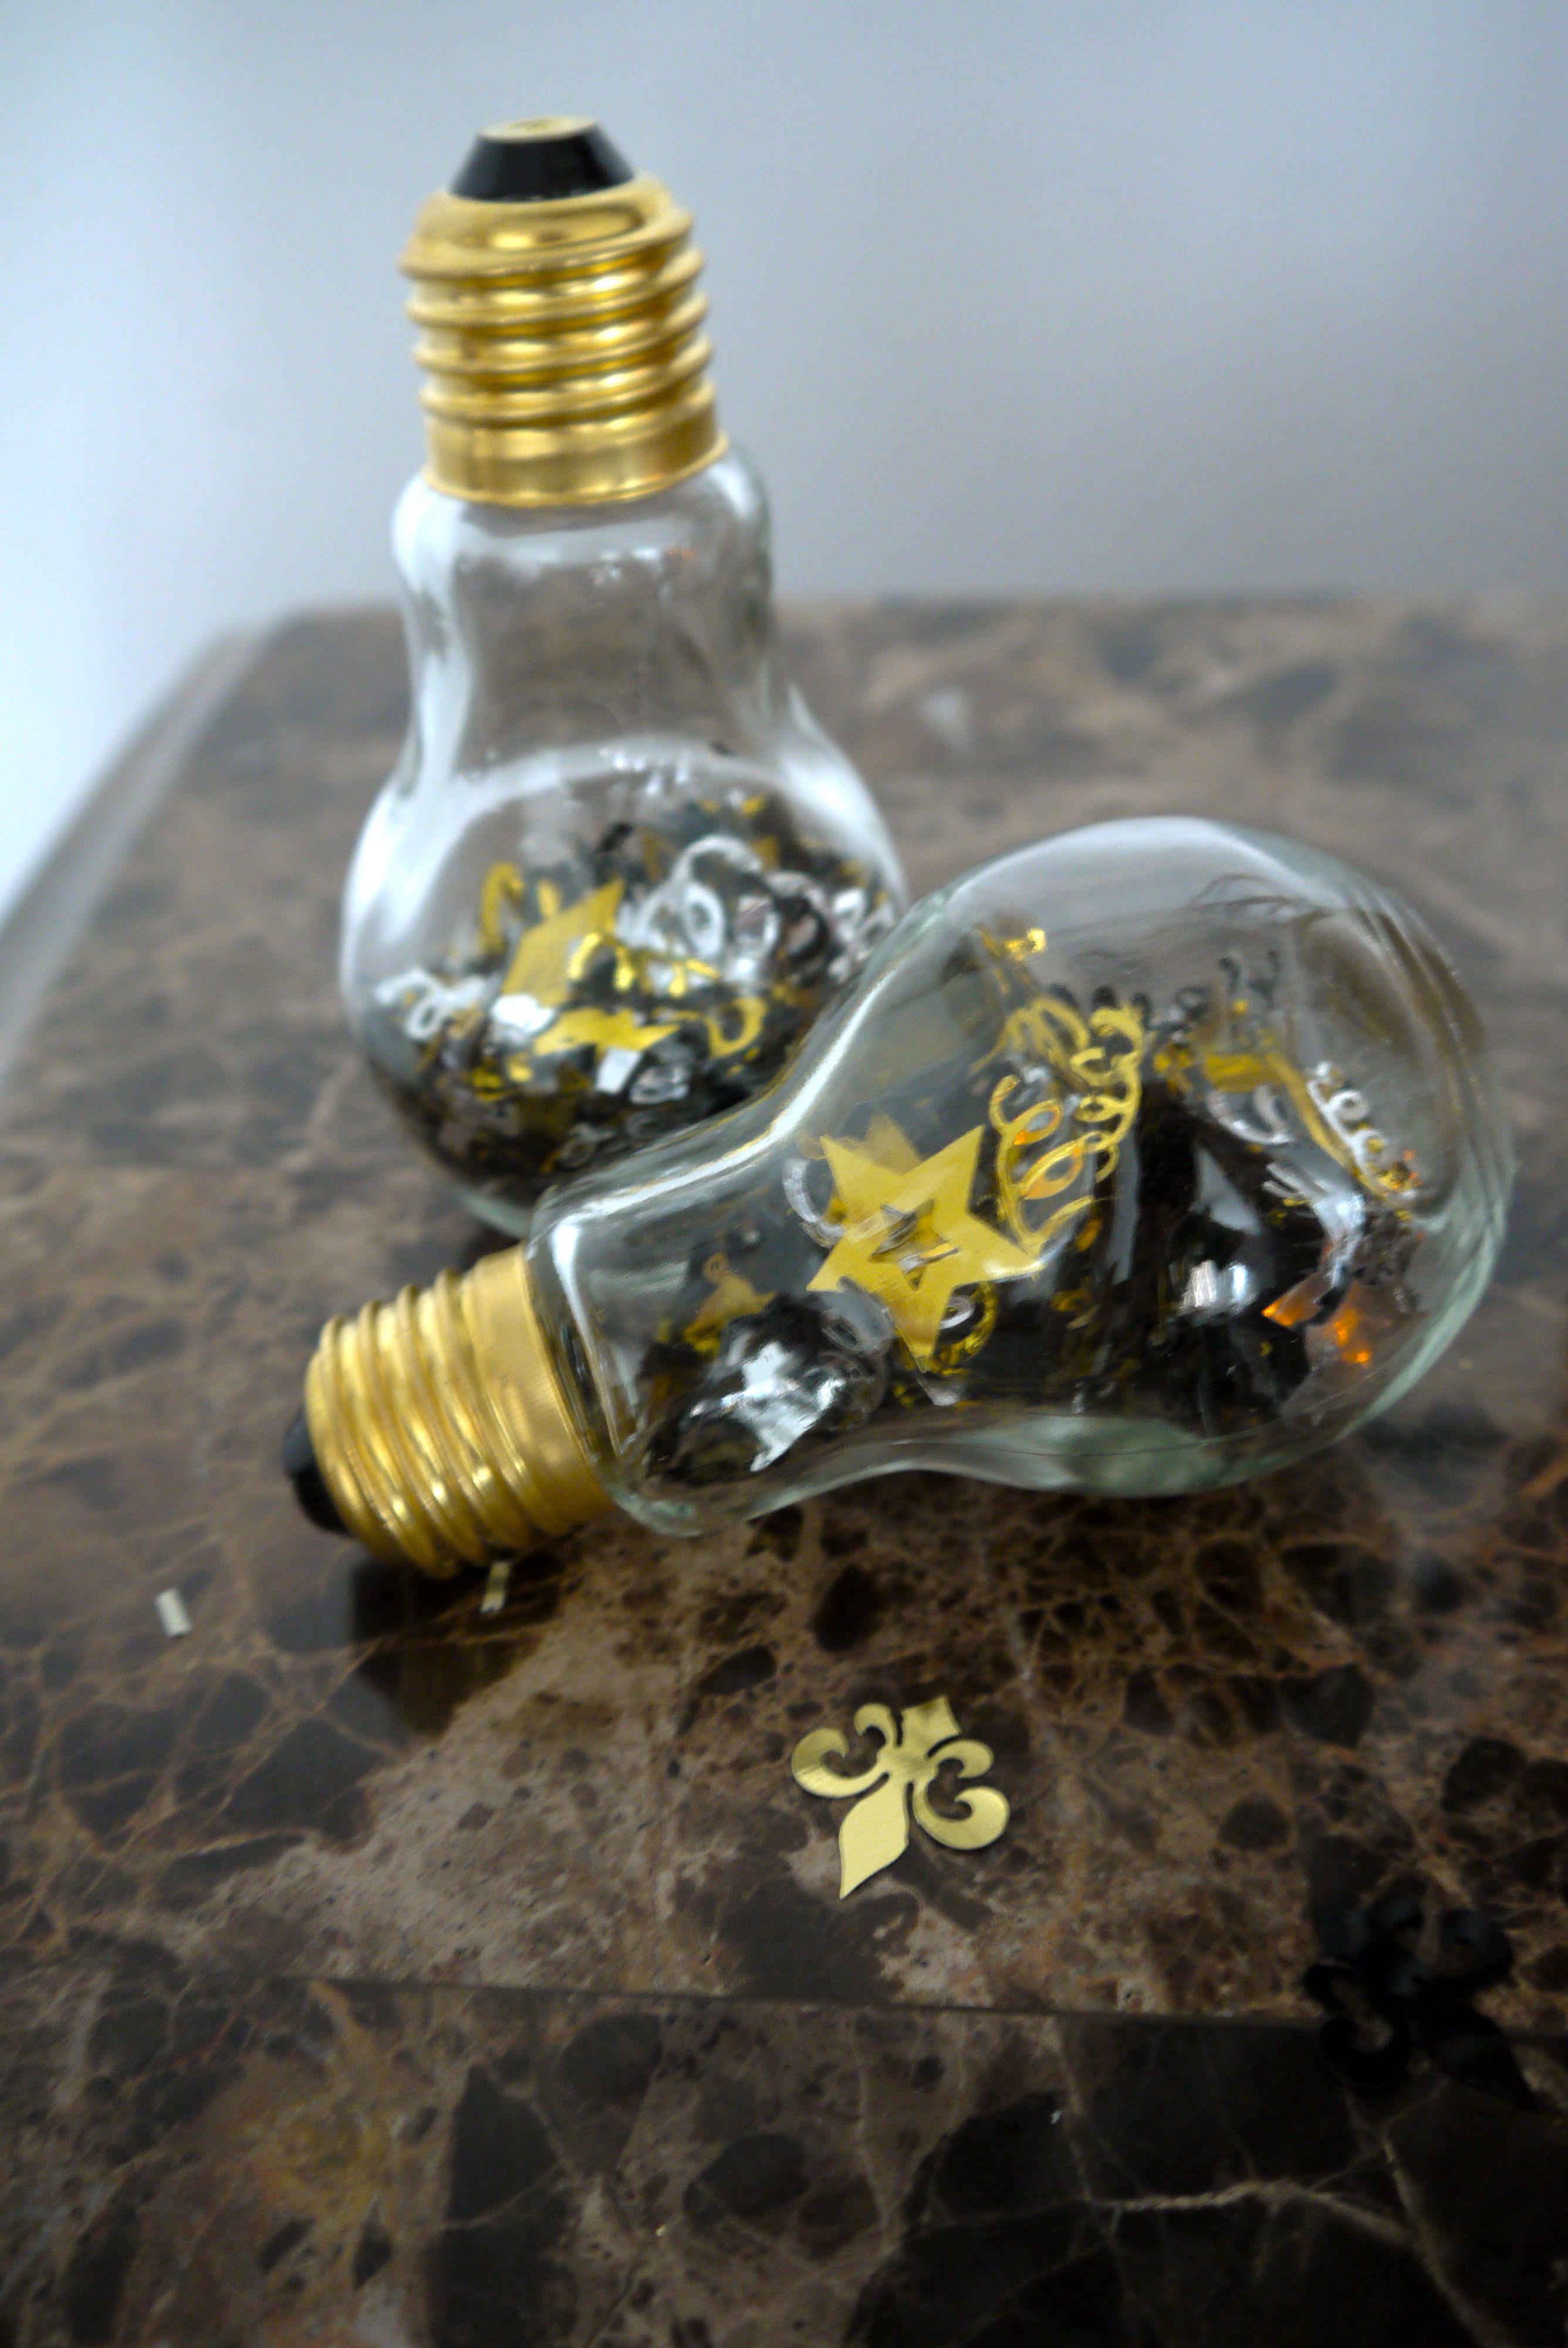 Pin By Krystal Hicks On Graduation Graduation Decorations Light Bulb Jar Graduation Center Pieces